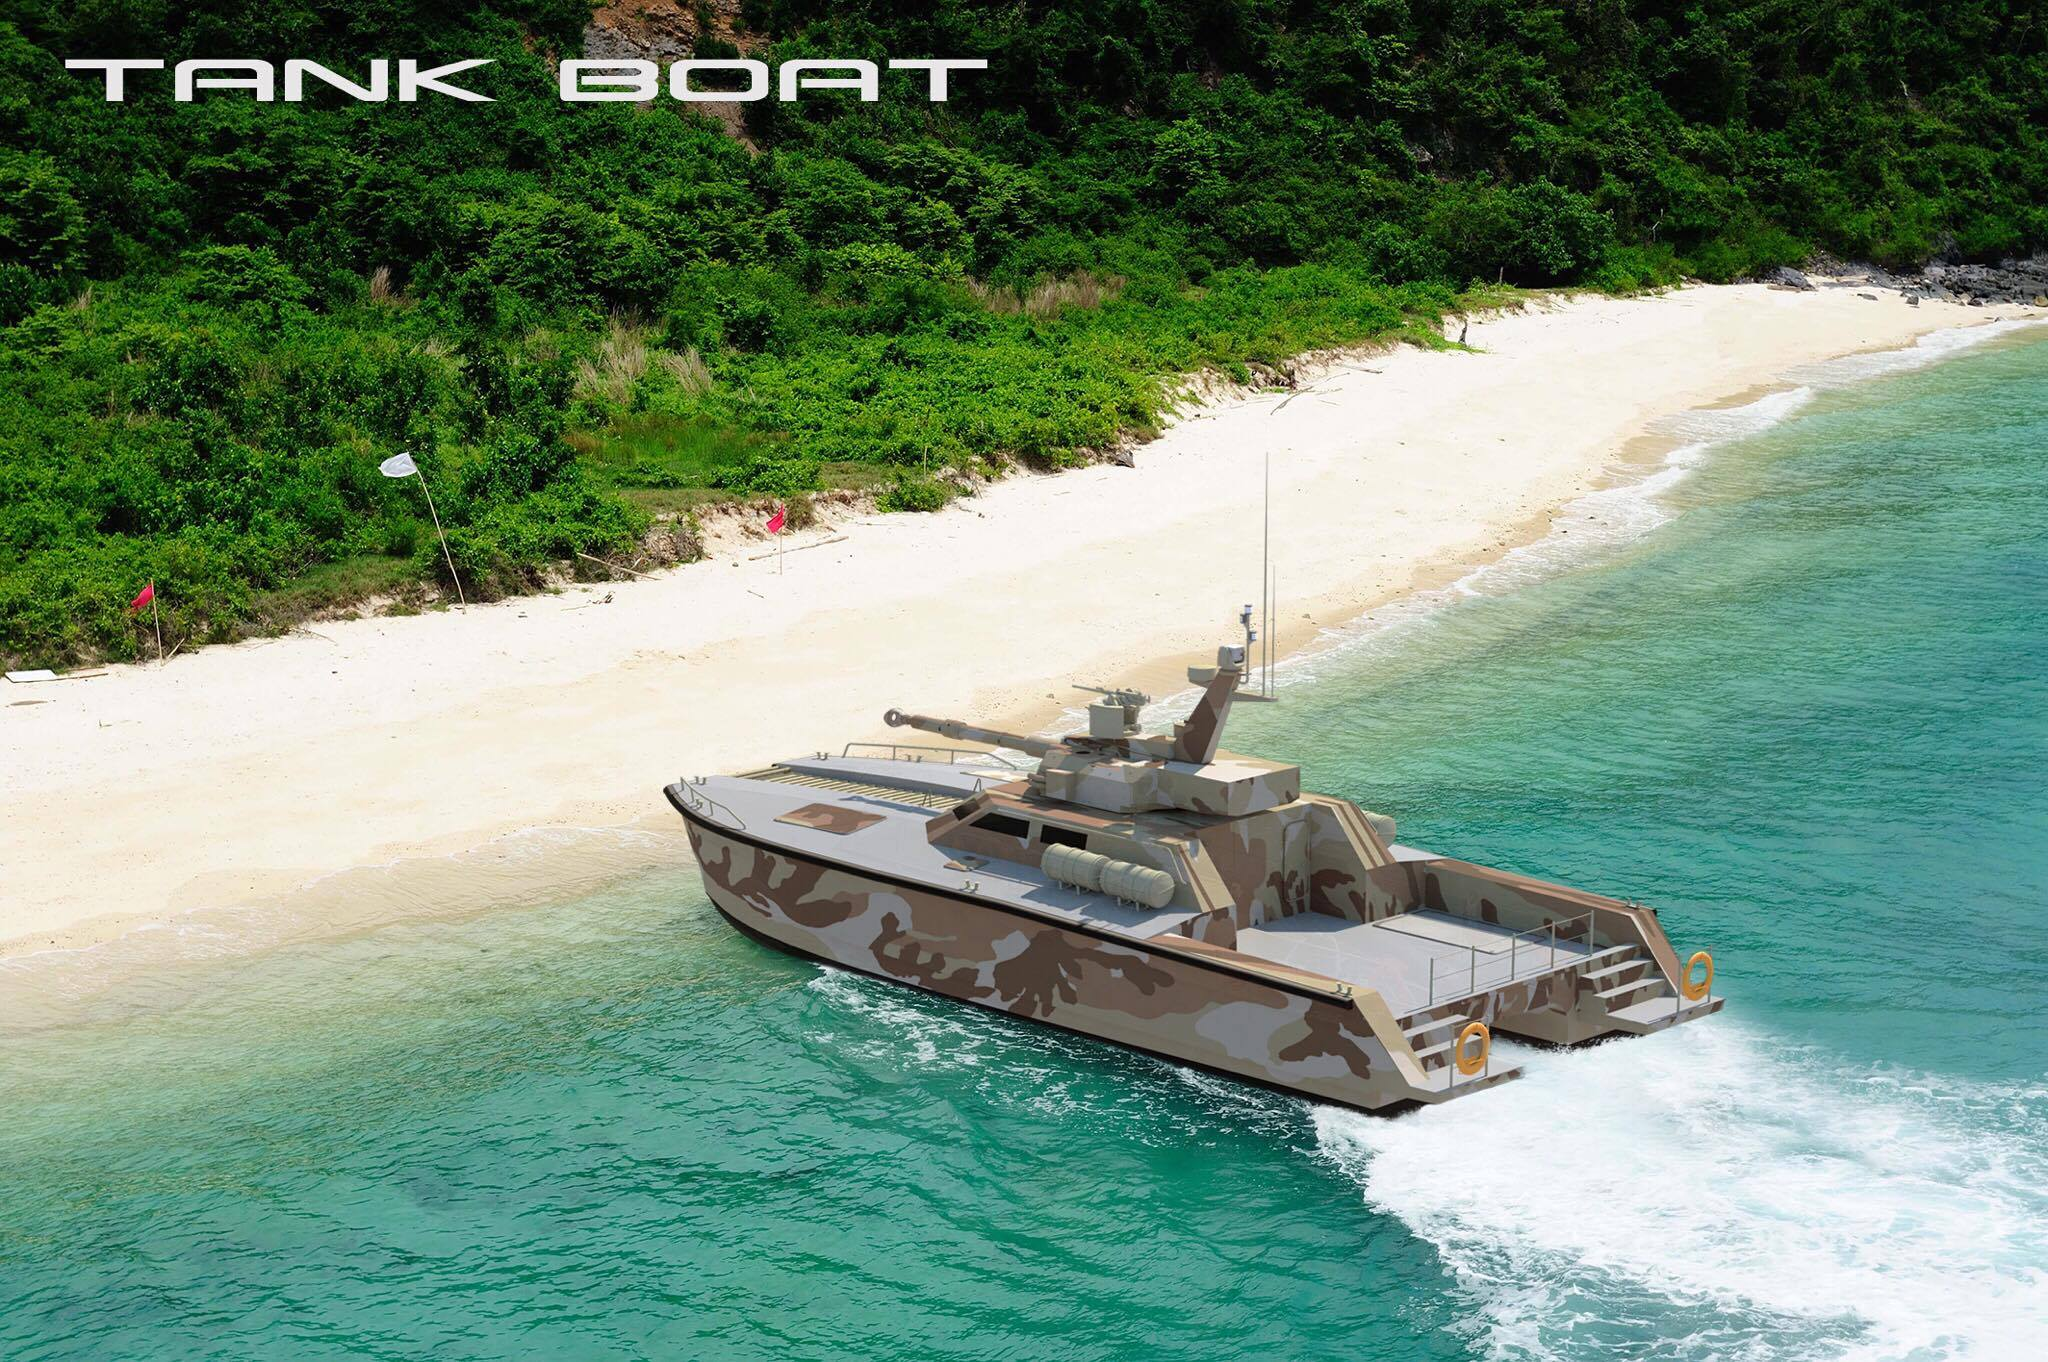 X-18 Tank Boat